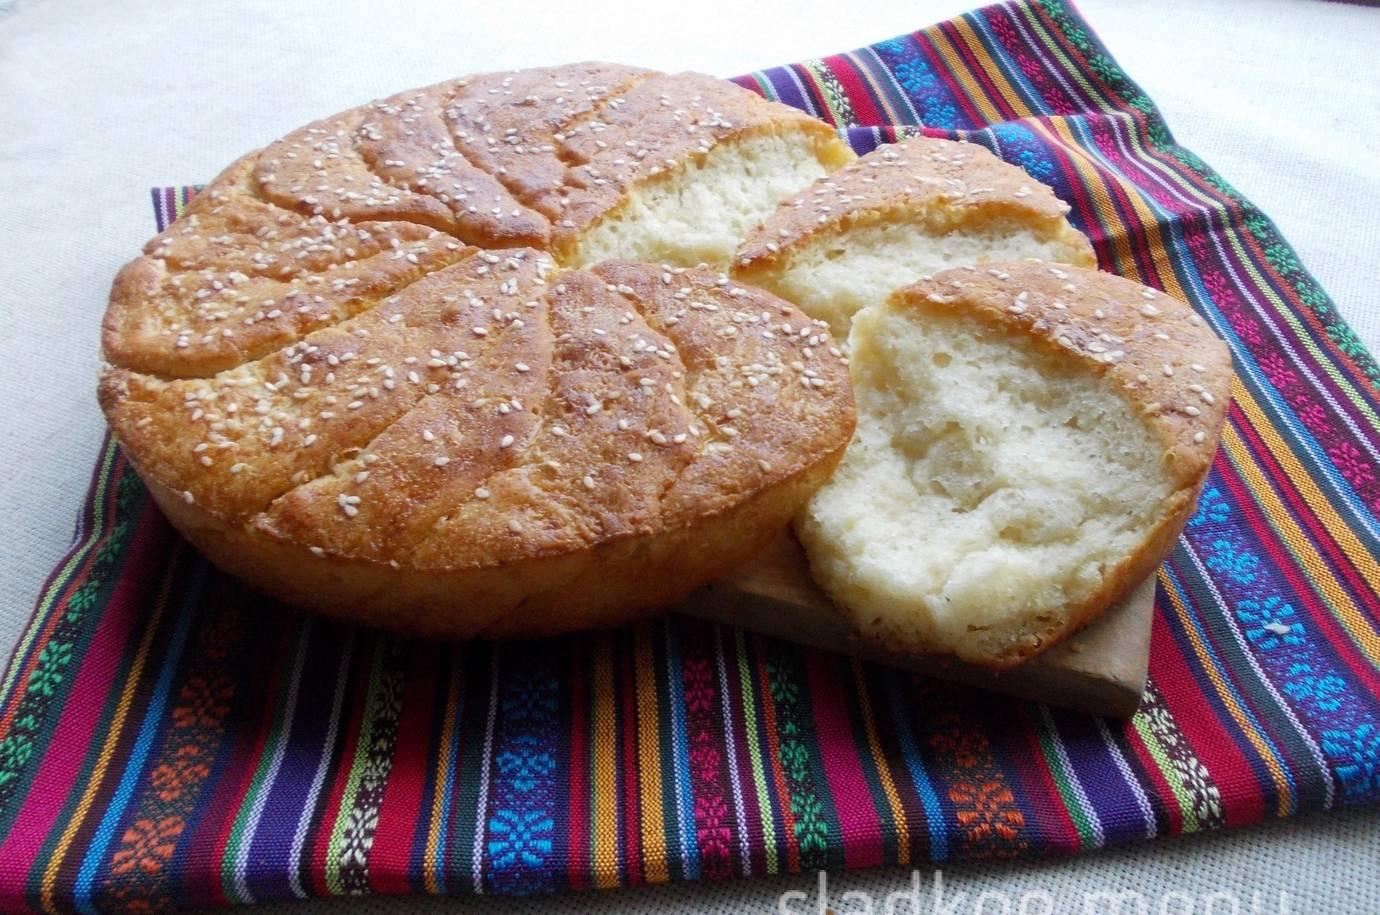 Сербский хлеб погачице, рецепт с фото сербского хлеба пошагово